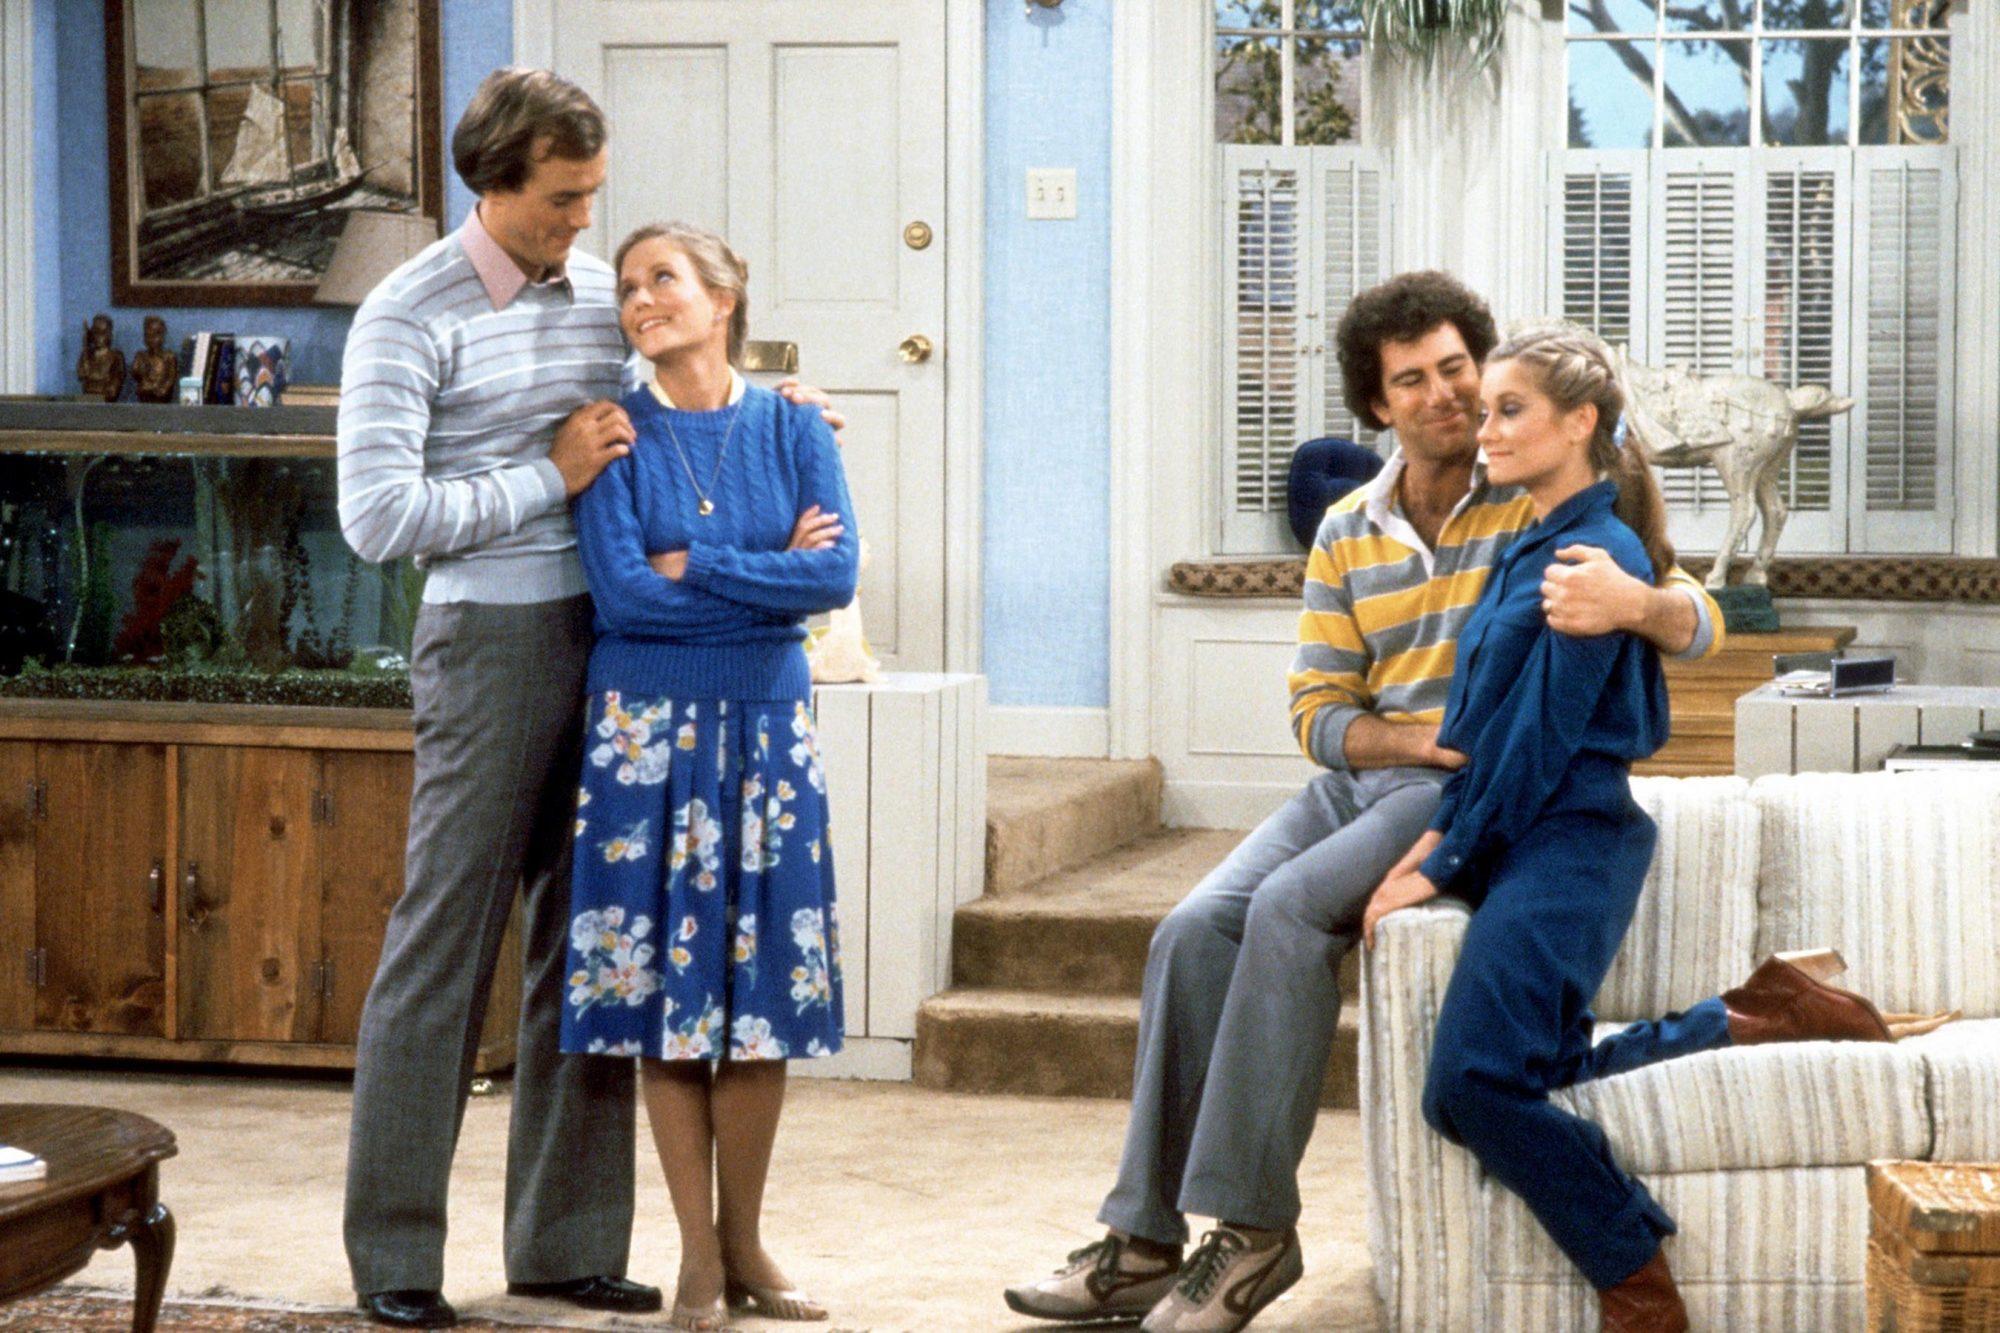 THE BRADY BRIDES, Ron Kuhlman, Eve Plumb, Jerry Houser, Maureen McCormick, 1981, (c)Paramount Televi